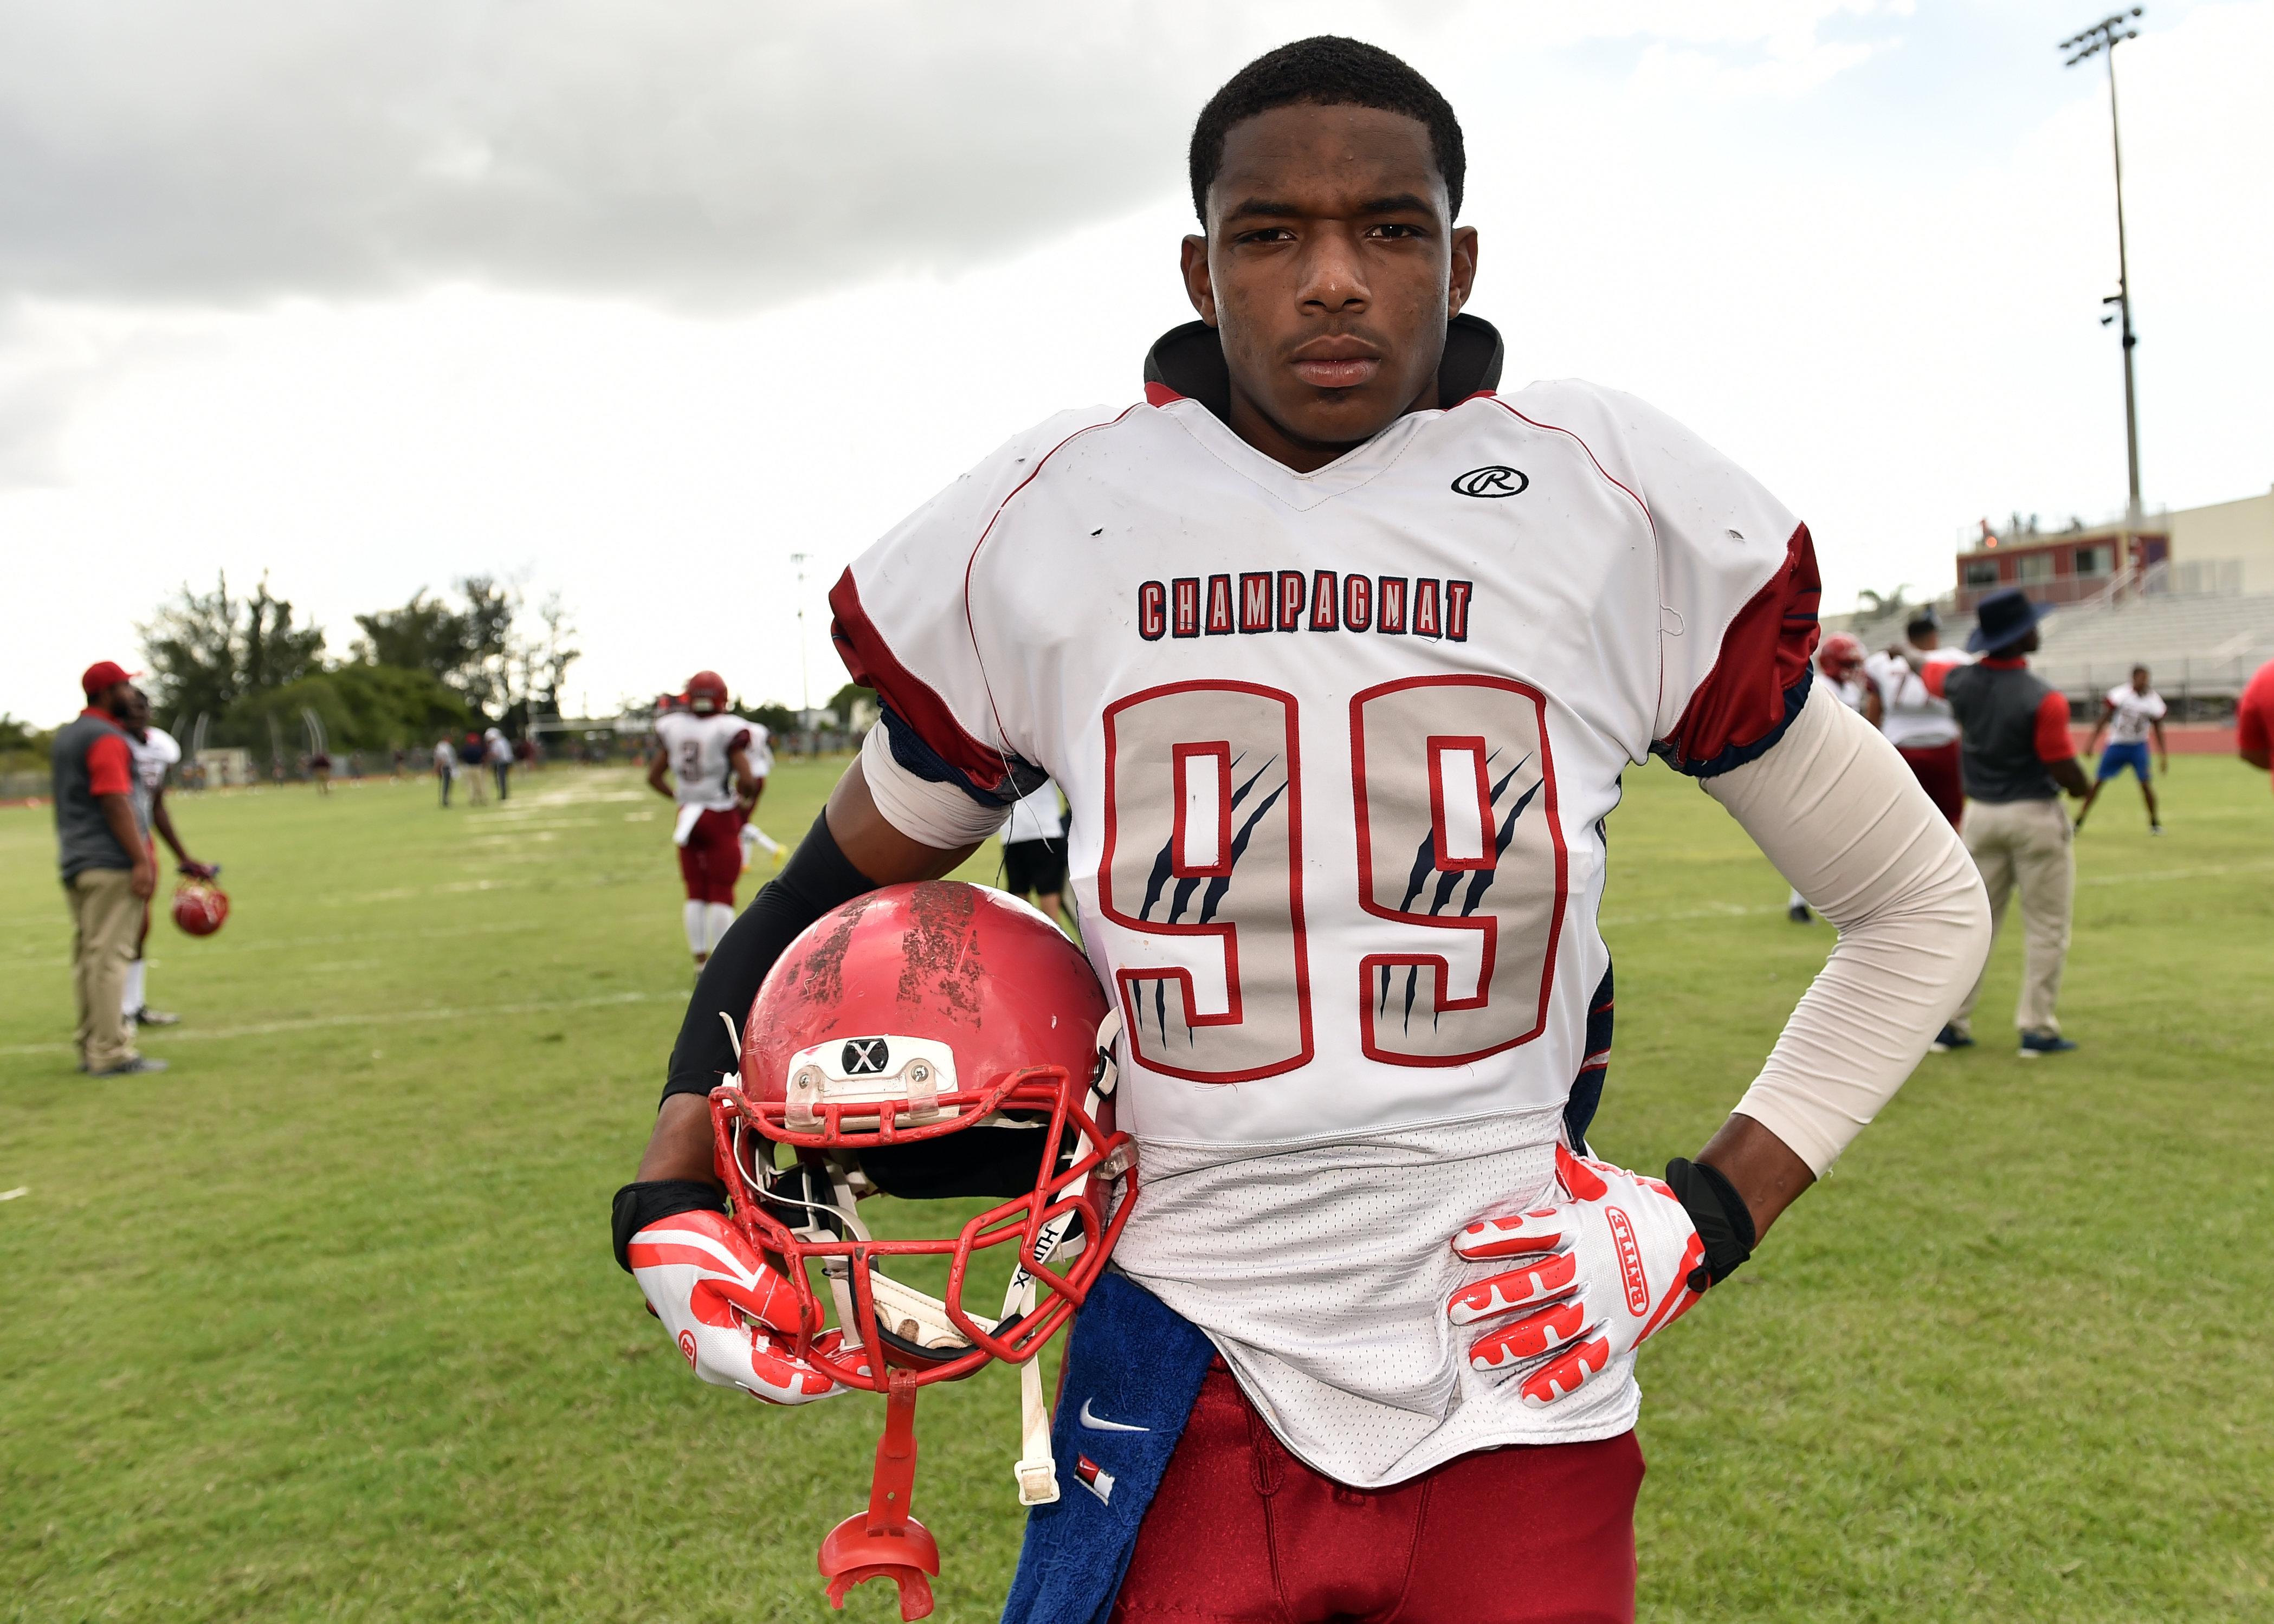 May 26 2016 Hallandale Beach, FL, U.S.A -- Jesus Machado, eighth grade football player -- Photo by Steve Mitchell USA TODAY Sports Images, Gannett ORG XMIT: US 134959 Jesus Machado 05/26/2016 [Via MerlinFTP Drop]